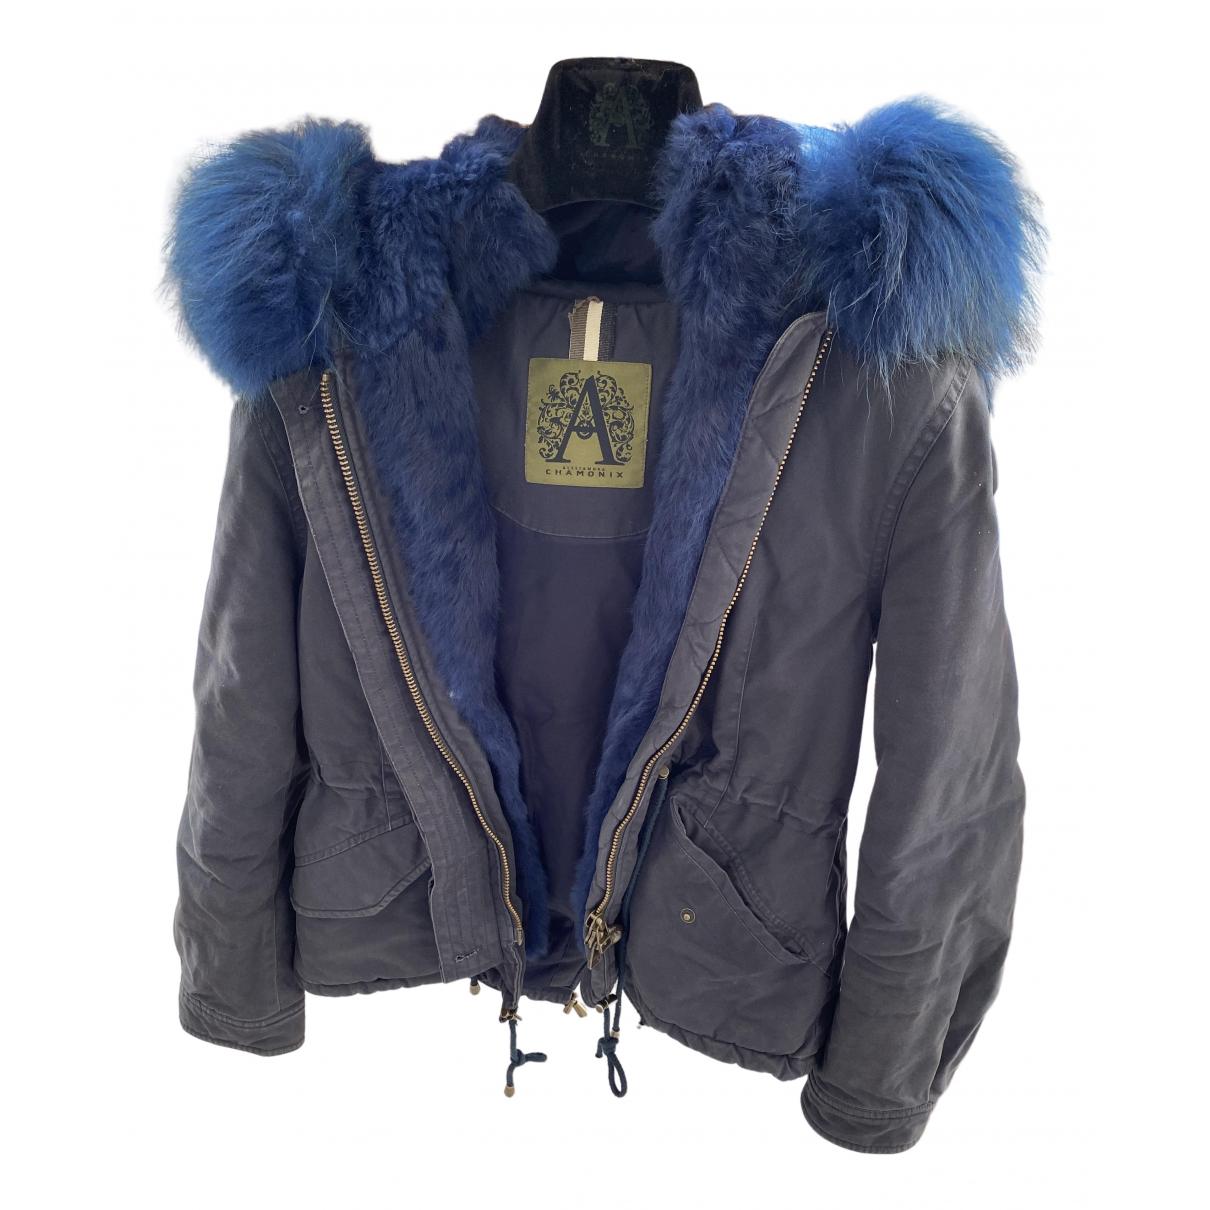 Abrigo en Poliester Azul Alessandra Chamonix